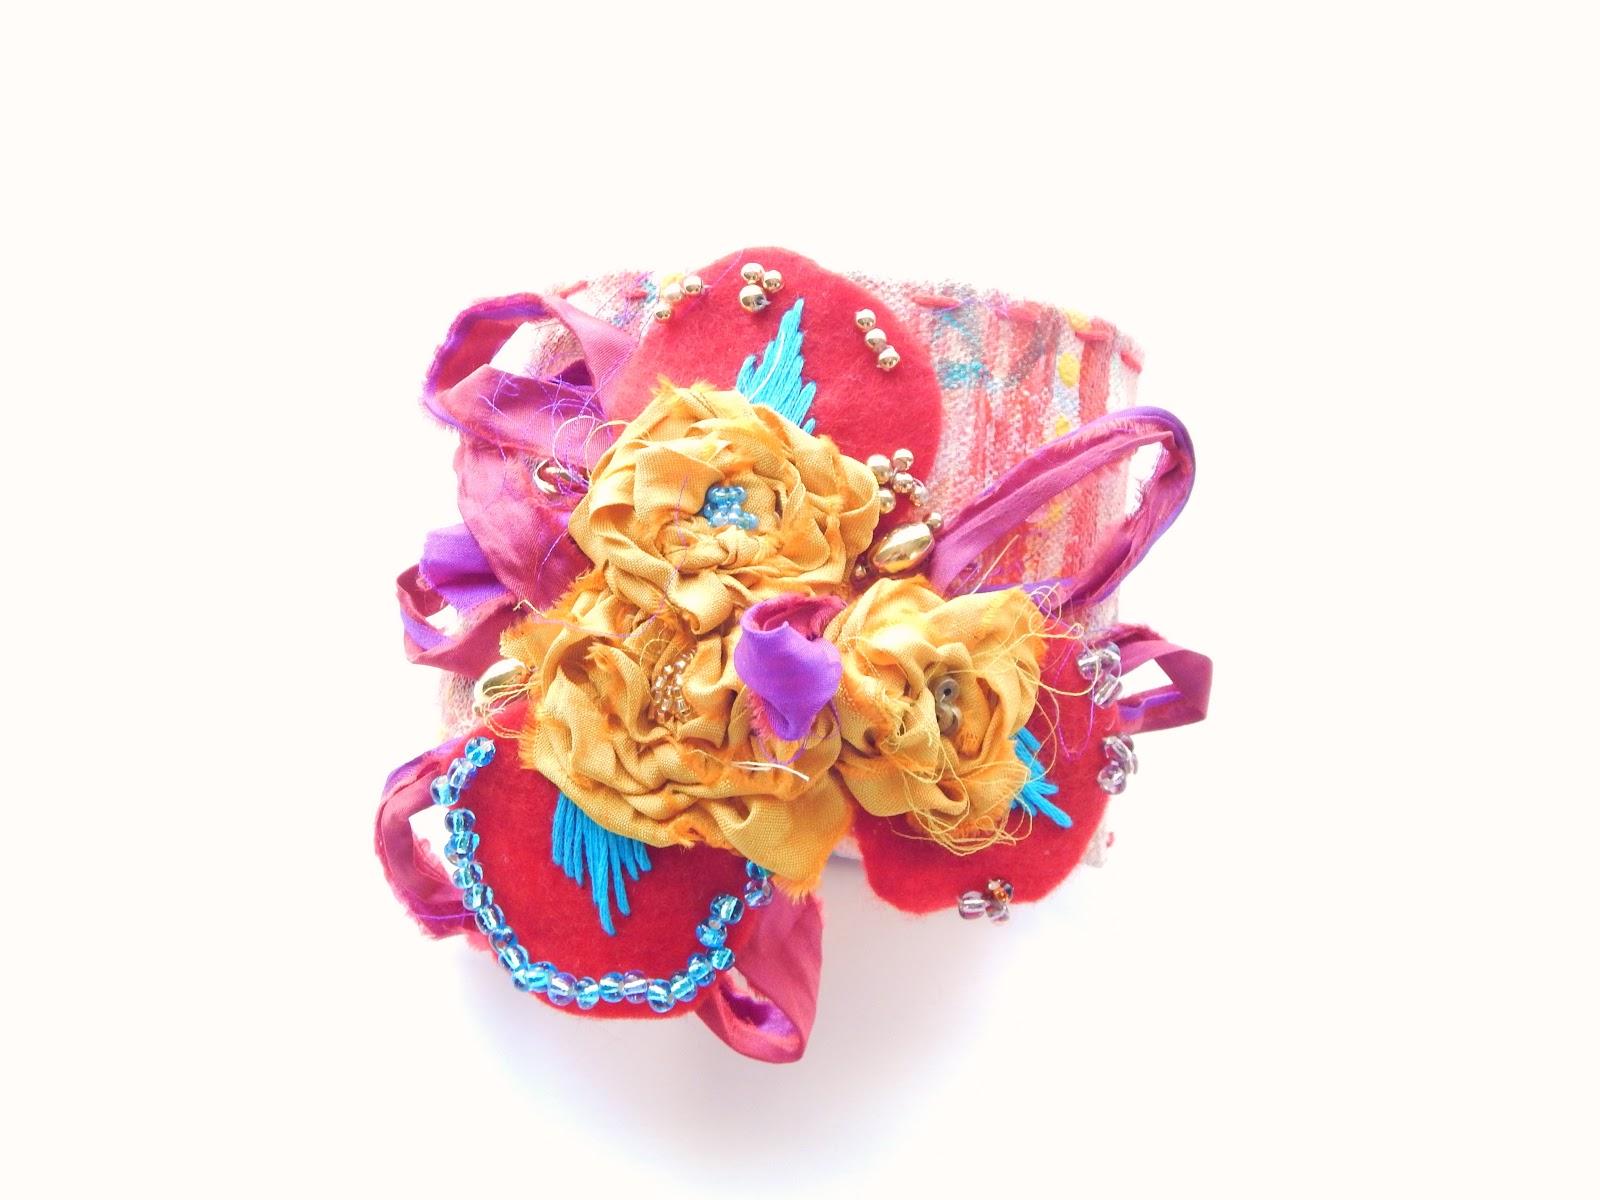 Wrist Cuff, Wristlet, Bracelet, handmade, colorful, gypsy wrist cuff